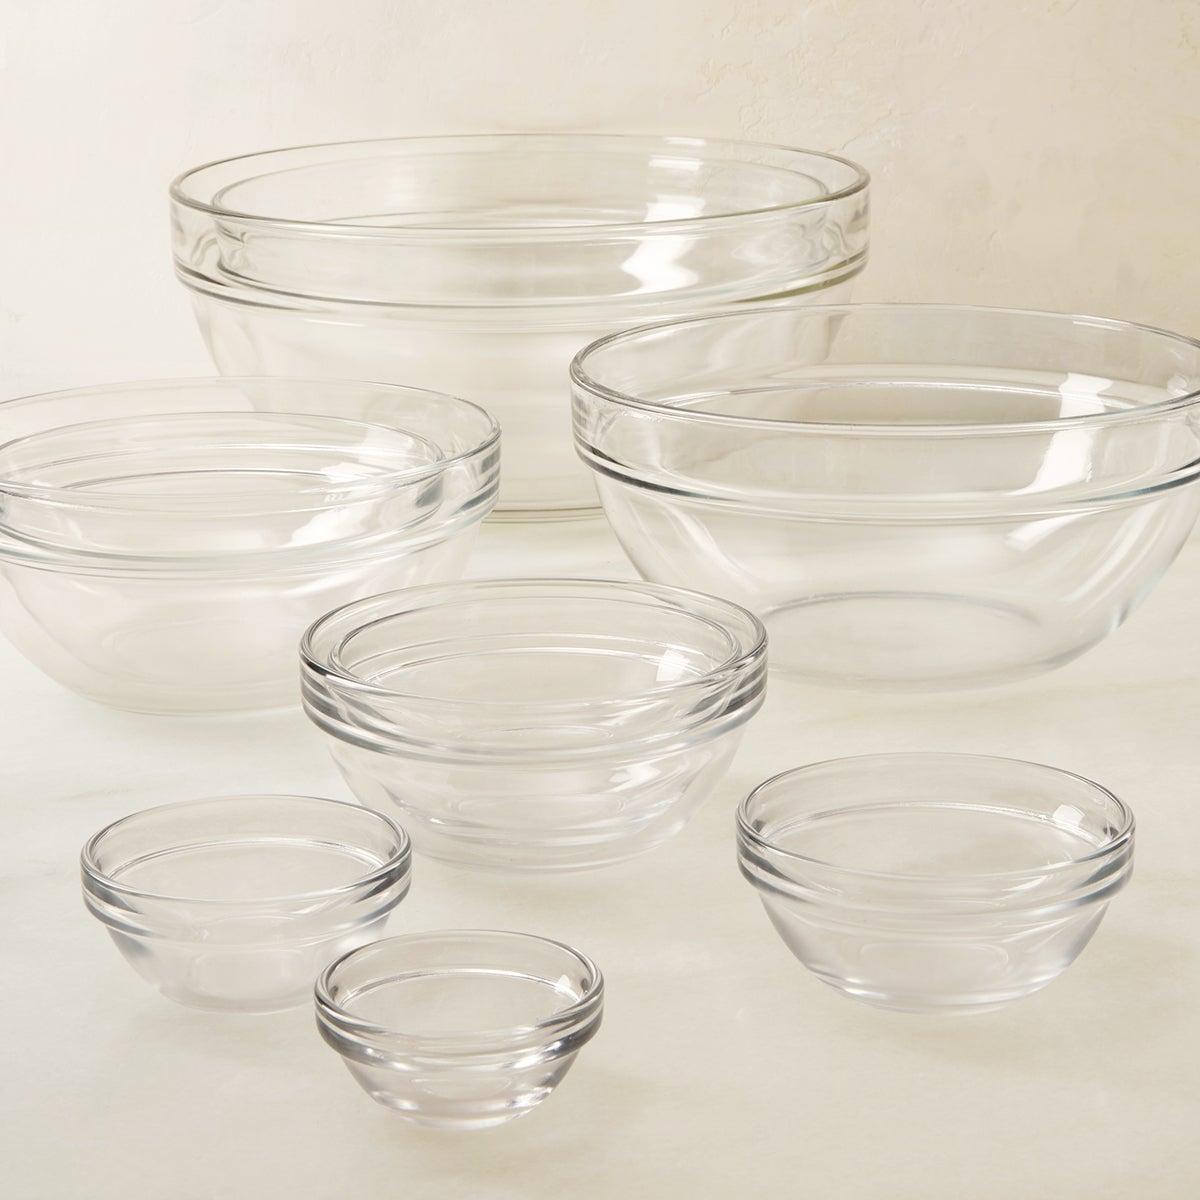 Check Out Prep Bowls, 10 Piece Set   Now Available At Blue Apron Market!